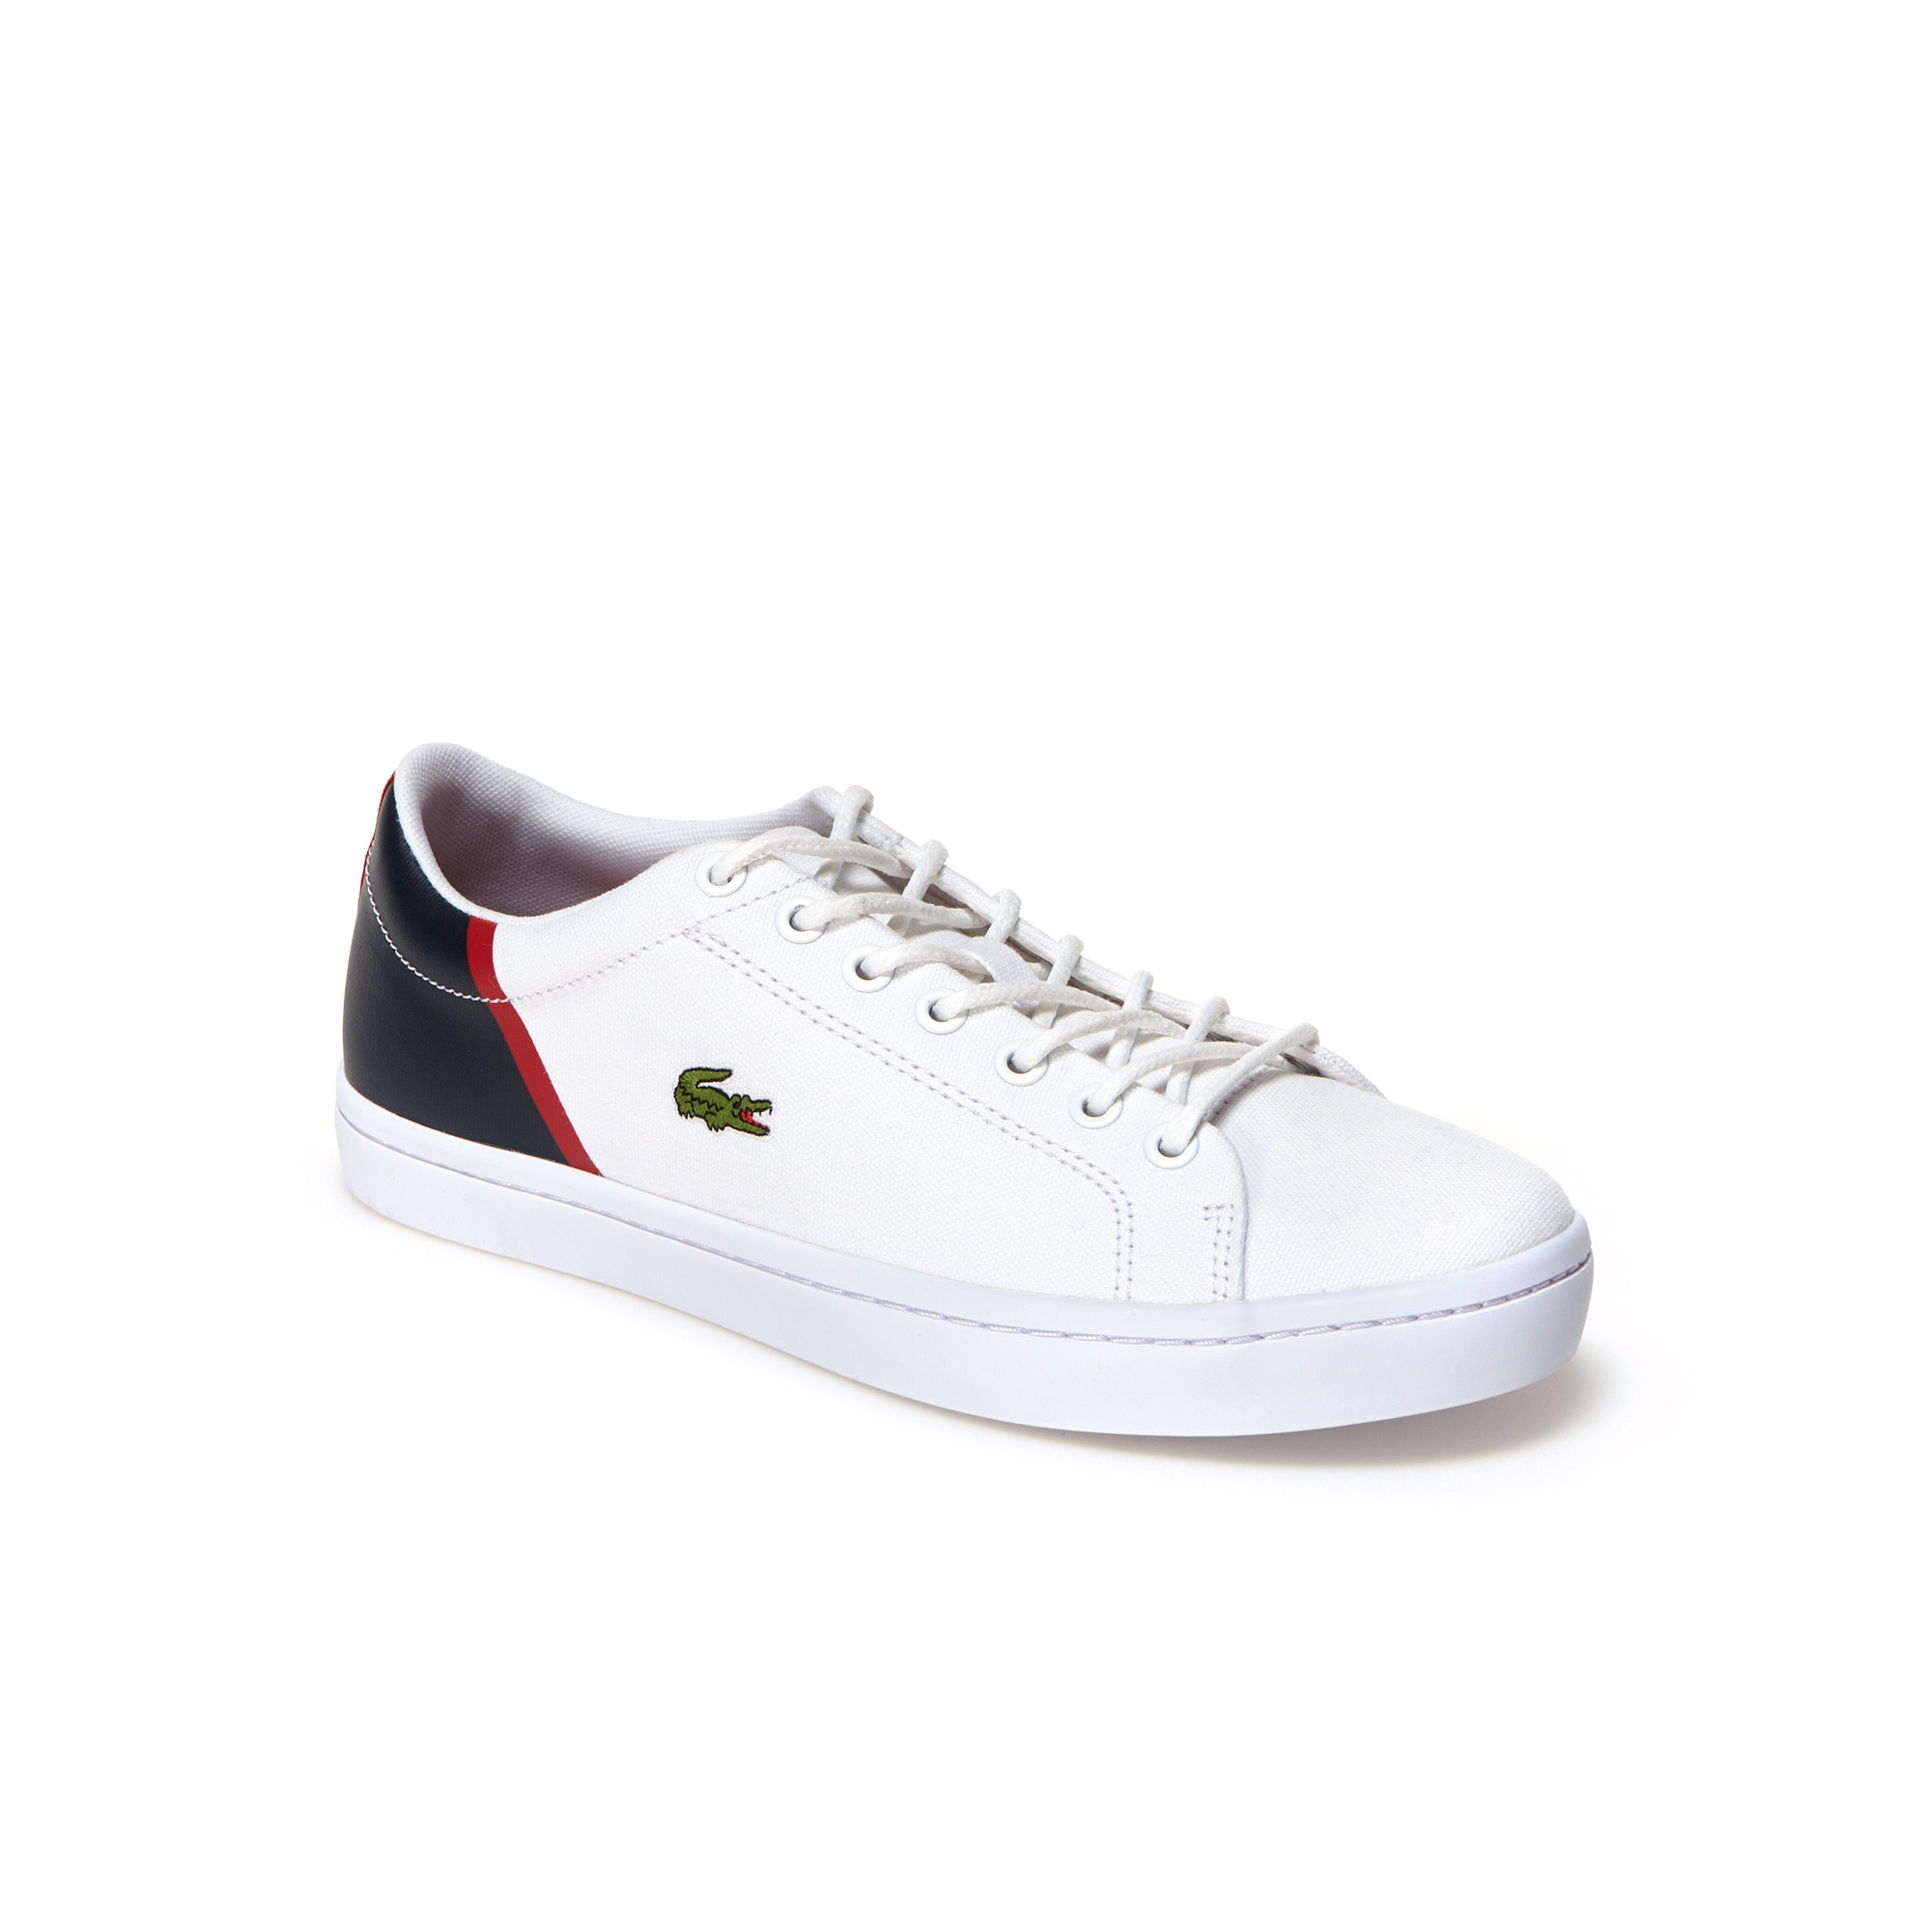 Herren-Sneakers STRAIGHTSET SPORT aus Stoff